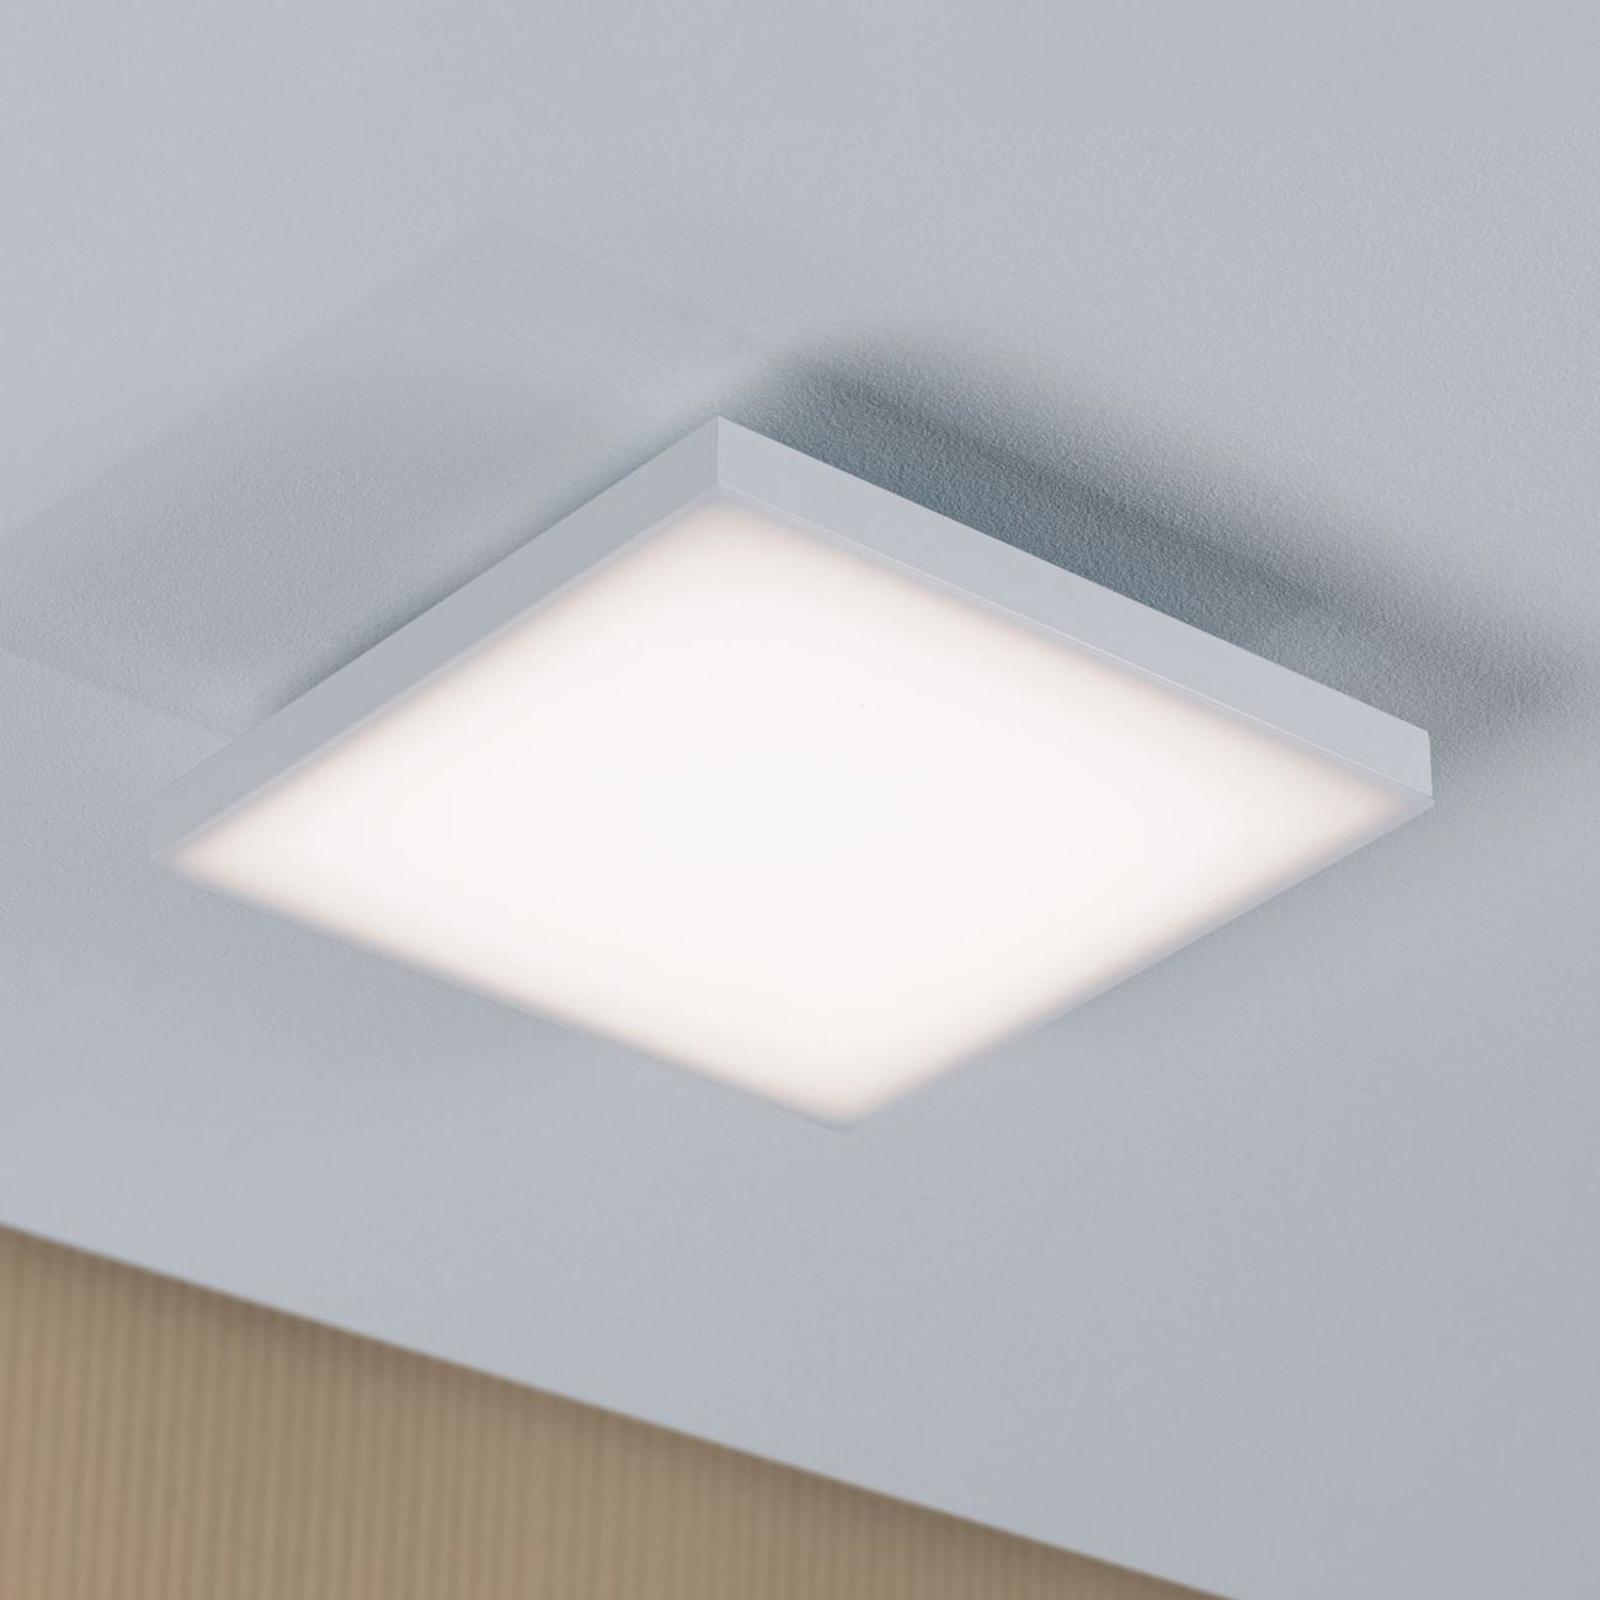 Paulmann Velora LED-Deckenleuchte 22,5 x 22,5cm